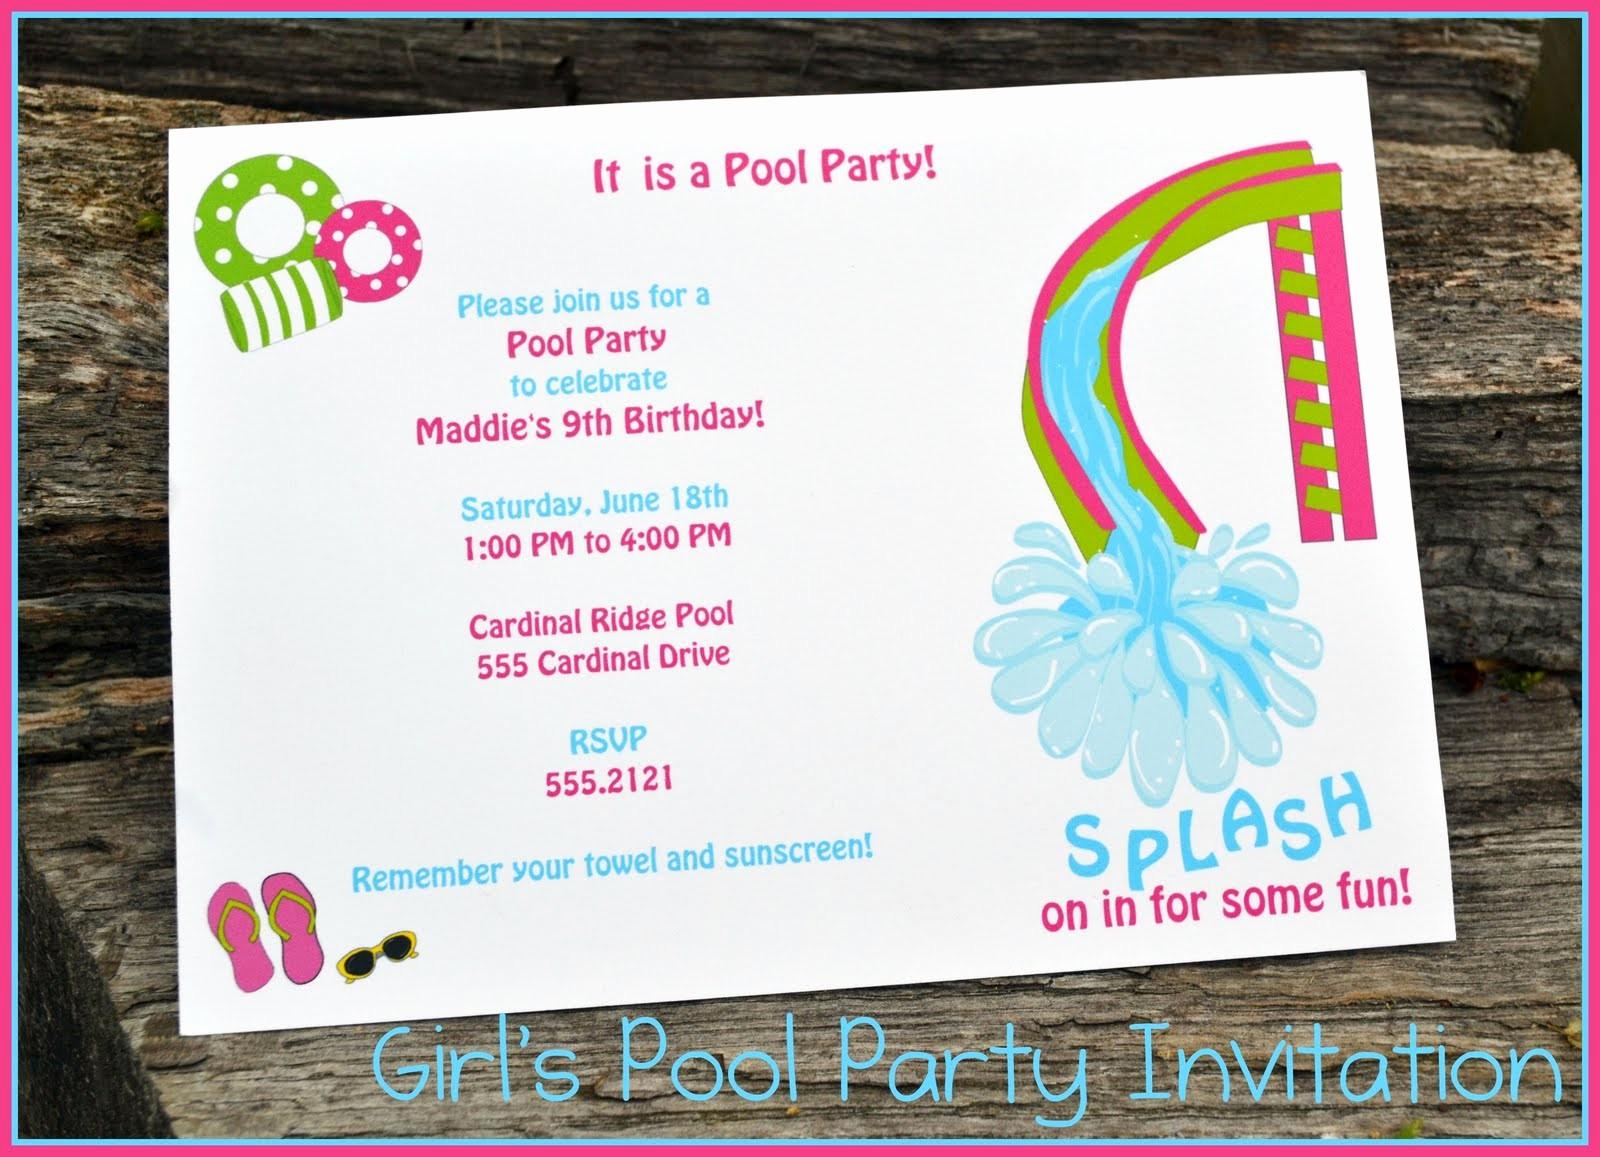 Year End Party Invitation Templates Elegant Pool Party Invitations Designs Tedxumkc Decoration Wedding